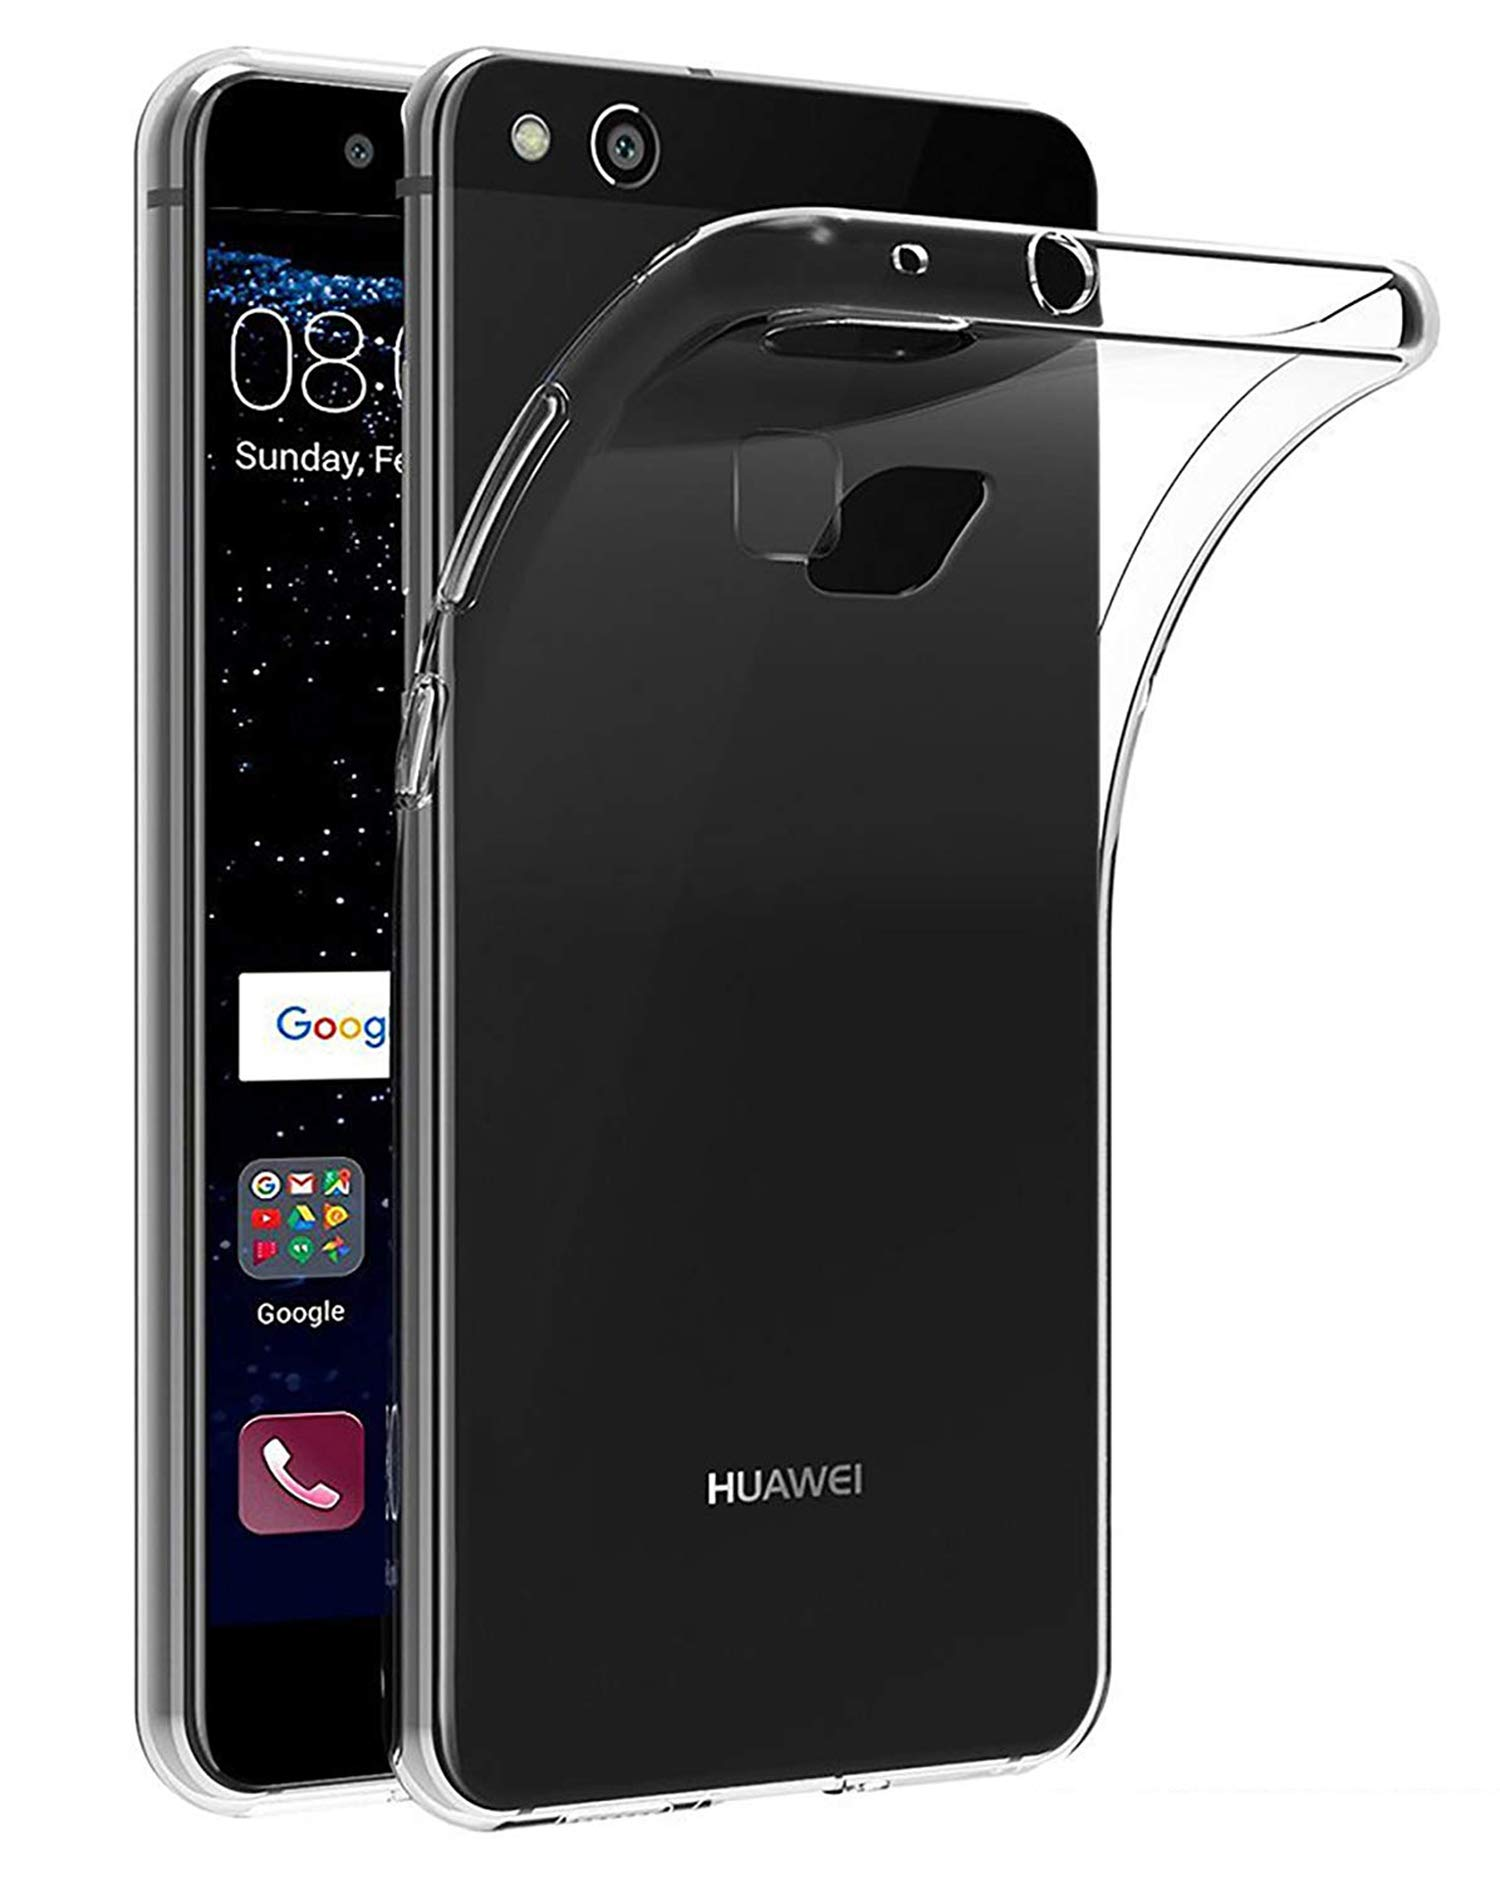 LUCKLYSTAR® Carcasa para Huawei P10 Lite Slim Transparente TPU Silicona Funda Anti-Rasguño Anti-Golpes Protective Case para Huawei P10 Lite(1PCS): Amazon.es: Hogar